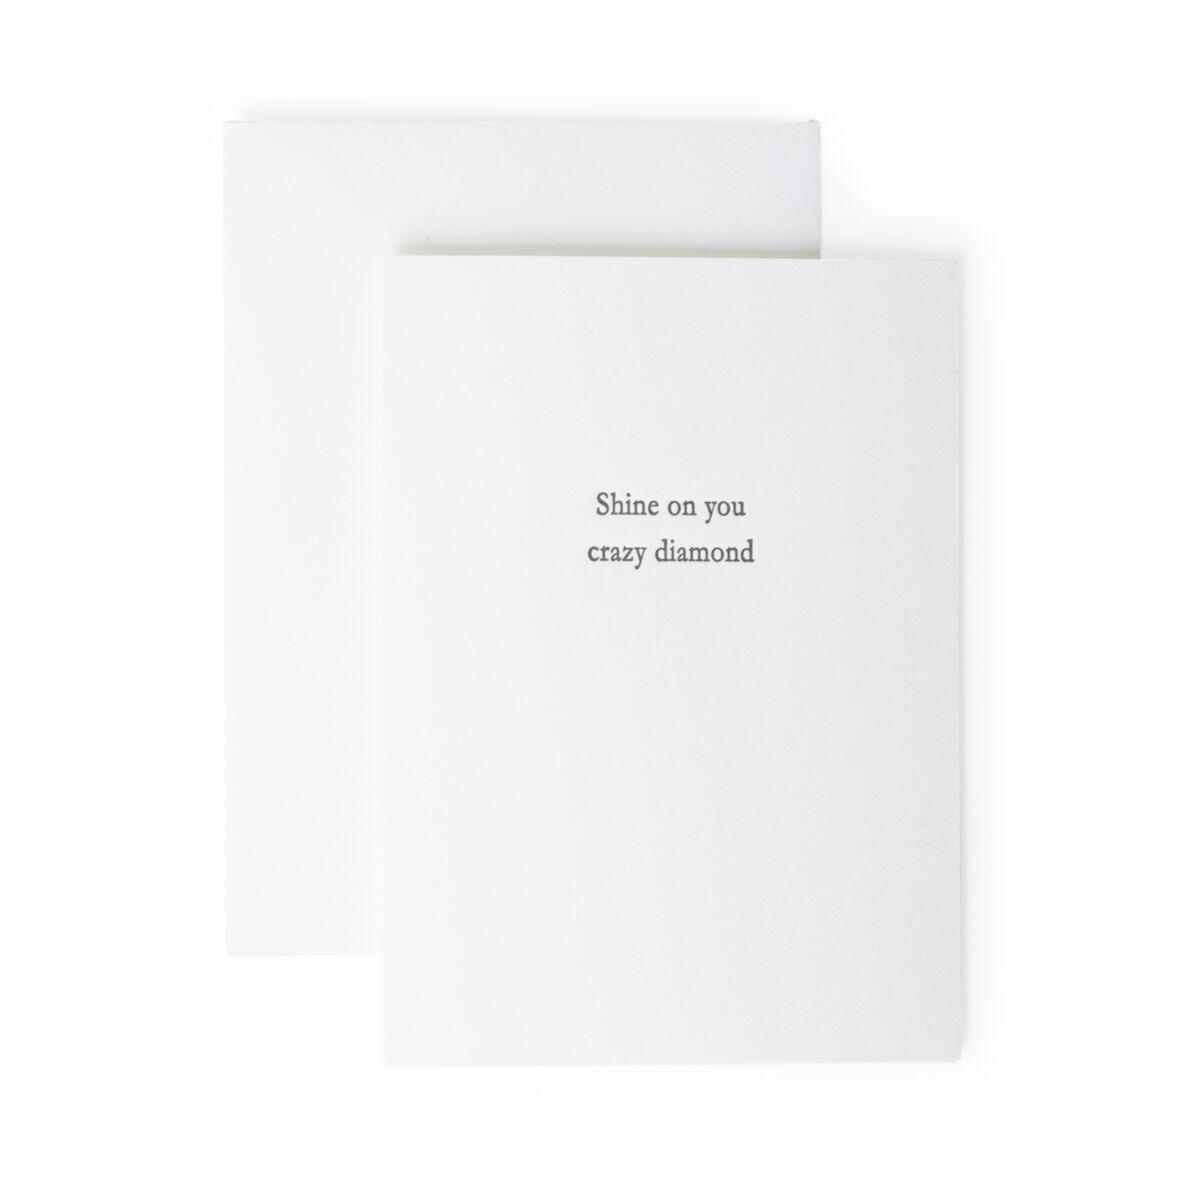 Shine On You Crazy Diamond Card